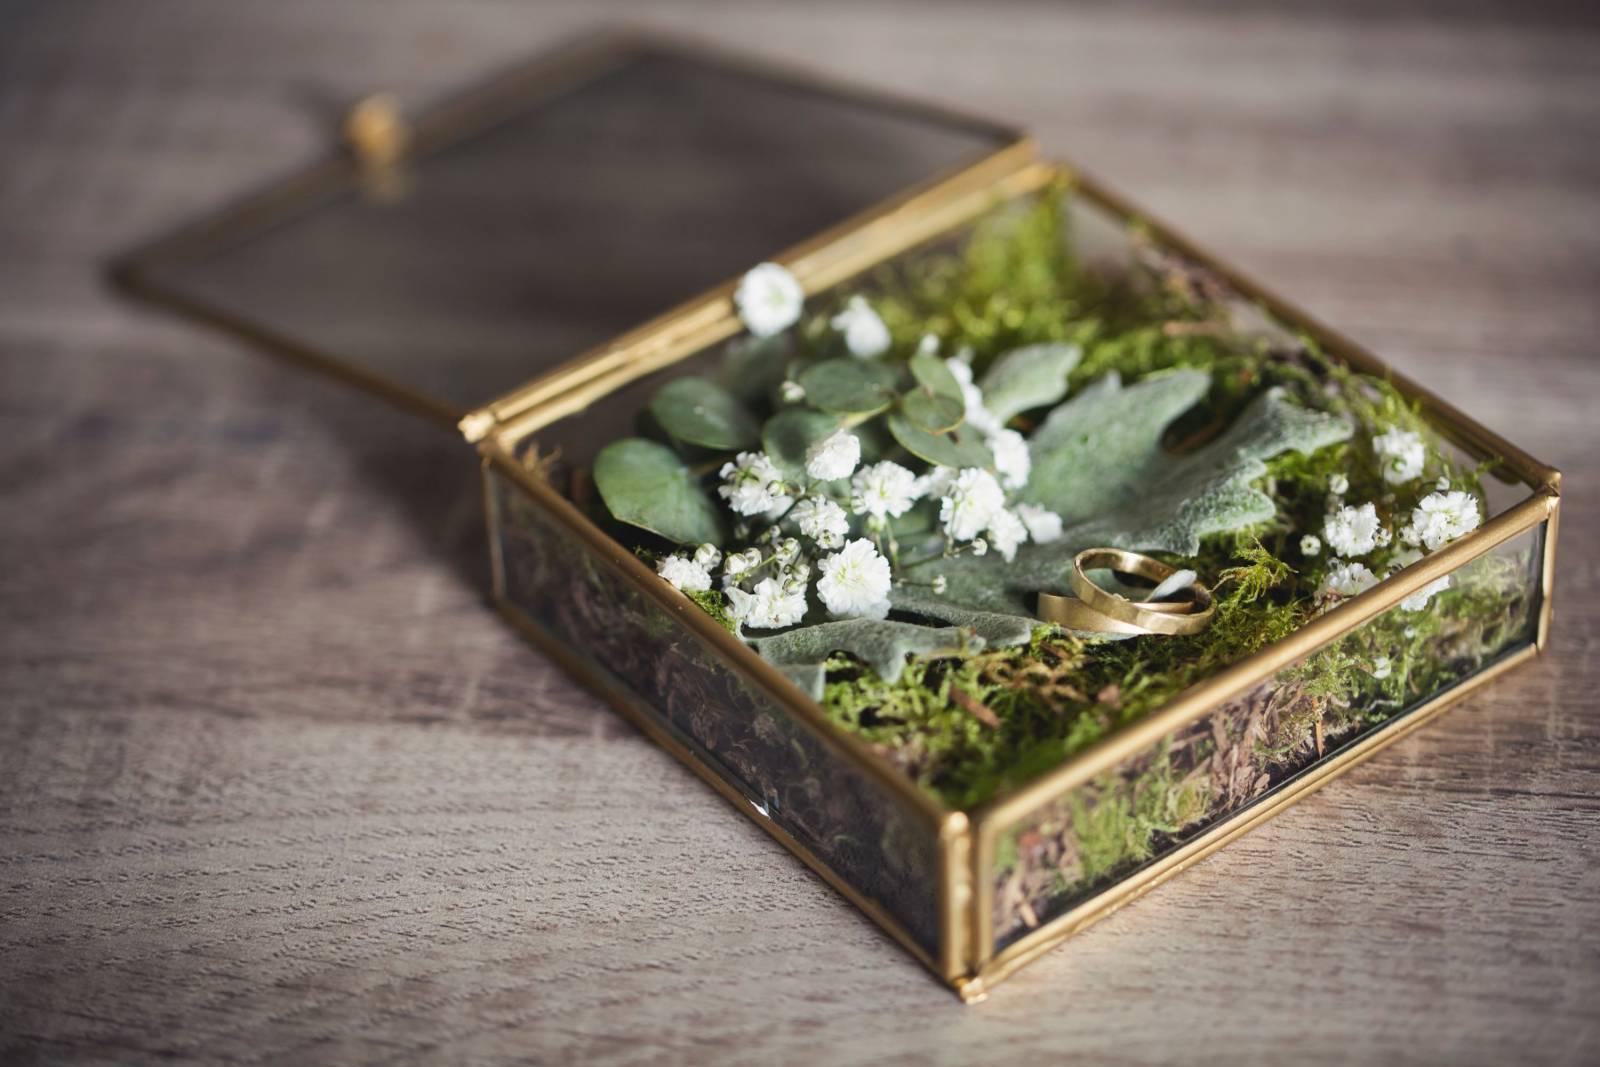 Carpe Diem Bloemen & Decoratie - House of Weddings  - 1